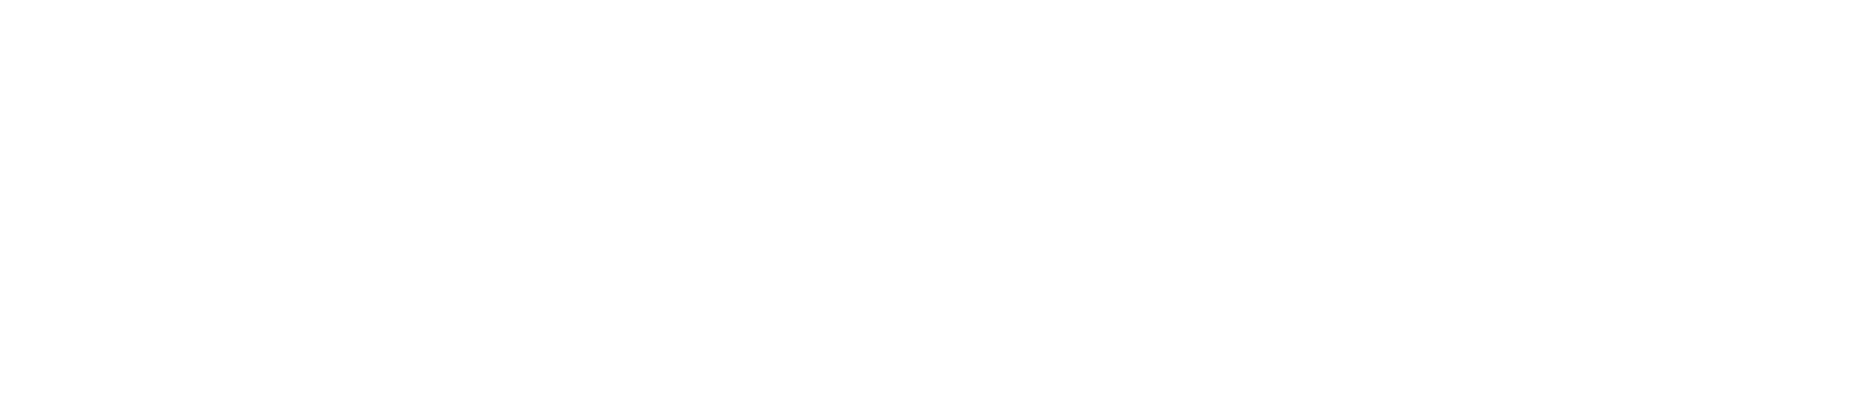 Horizontal_RGB_PNG_White.png